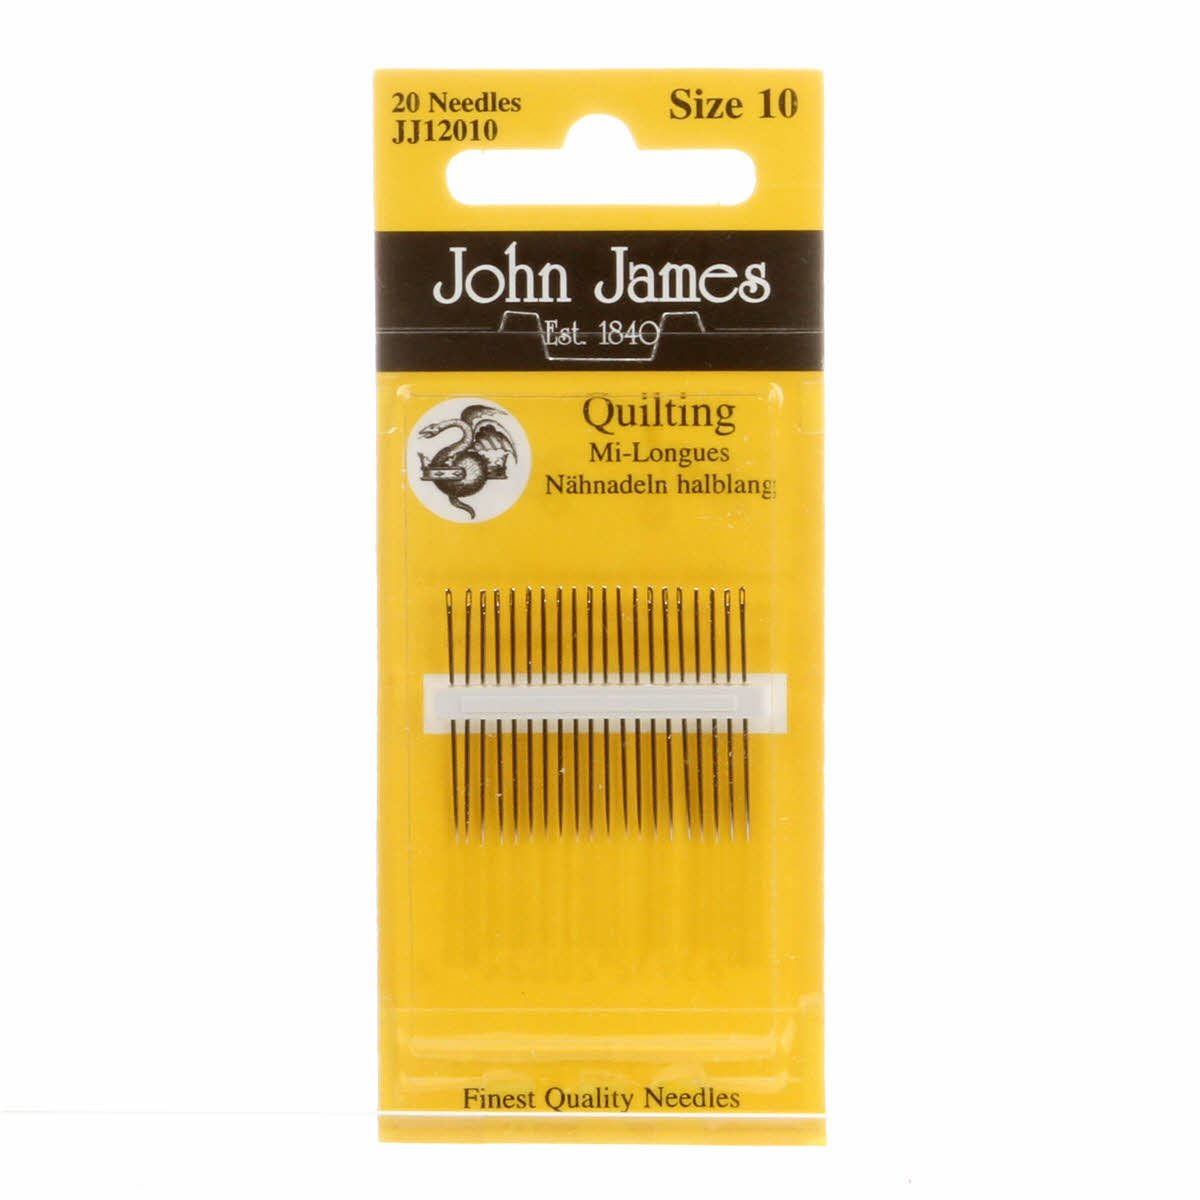 John James Quilting Needles Size 10 (JJ120-10)20 needles